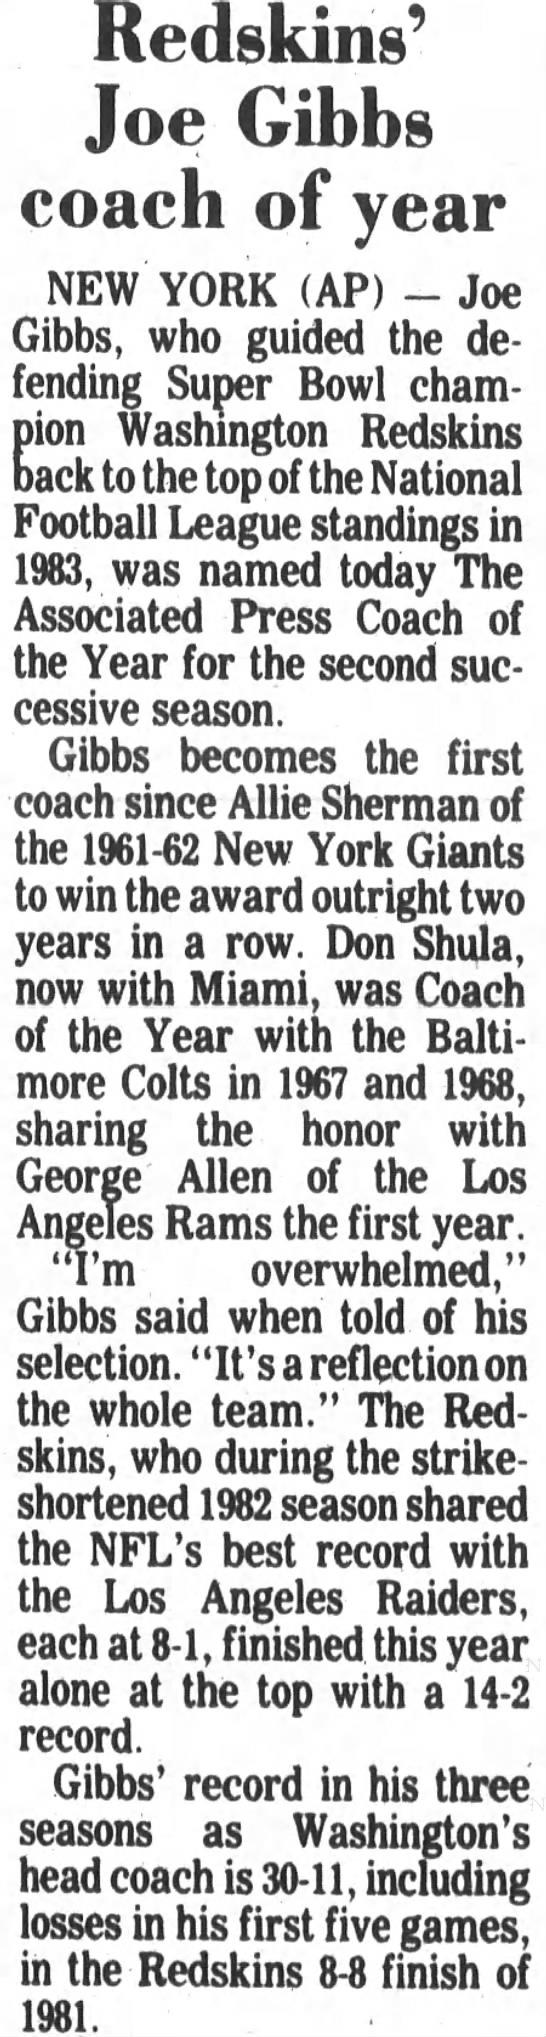 Redskins' Joe Gibbs coach of year -